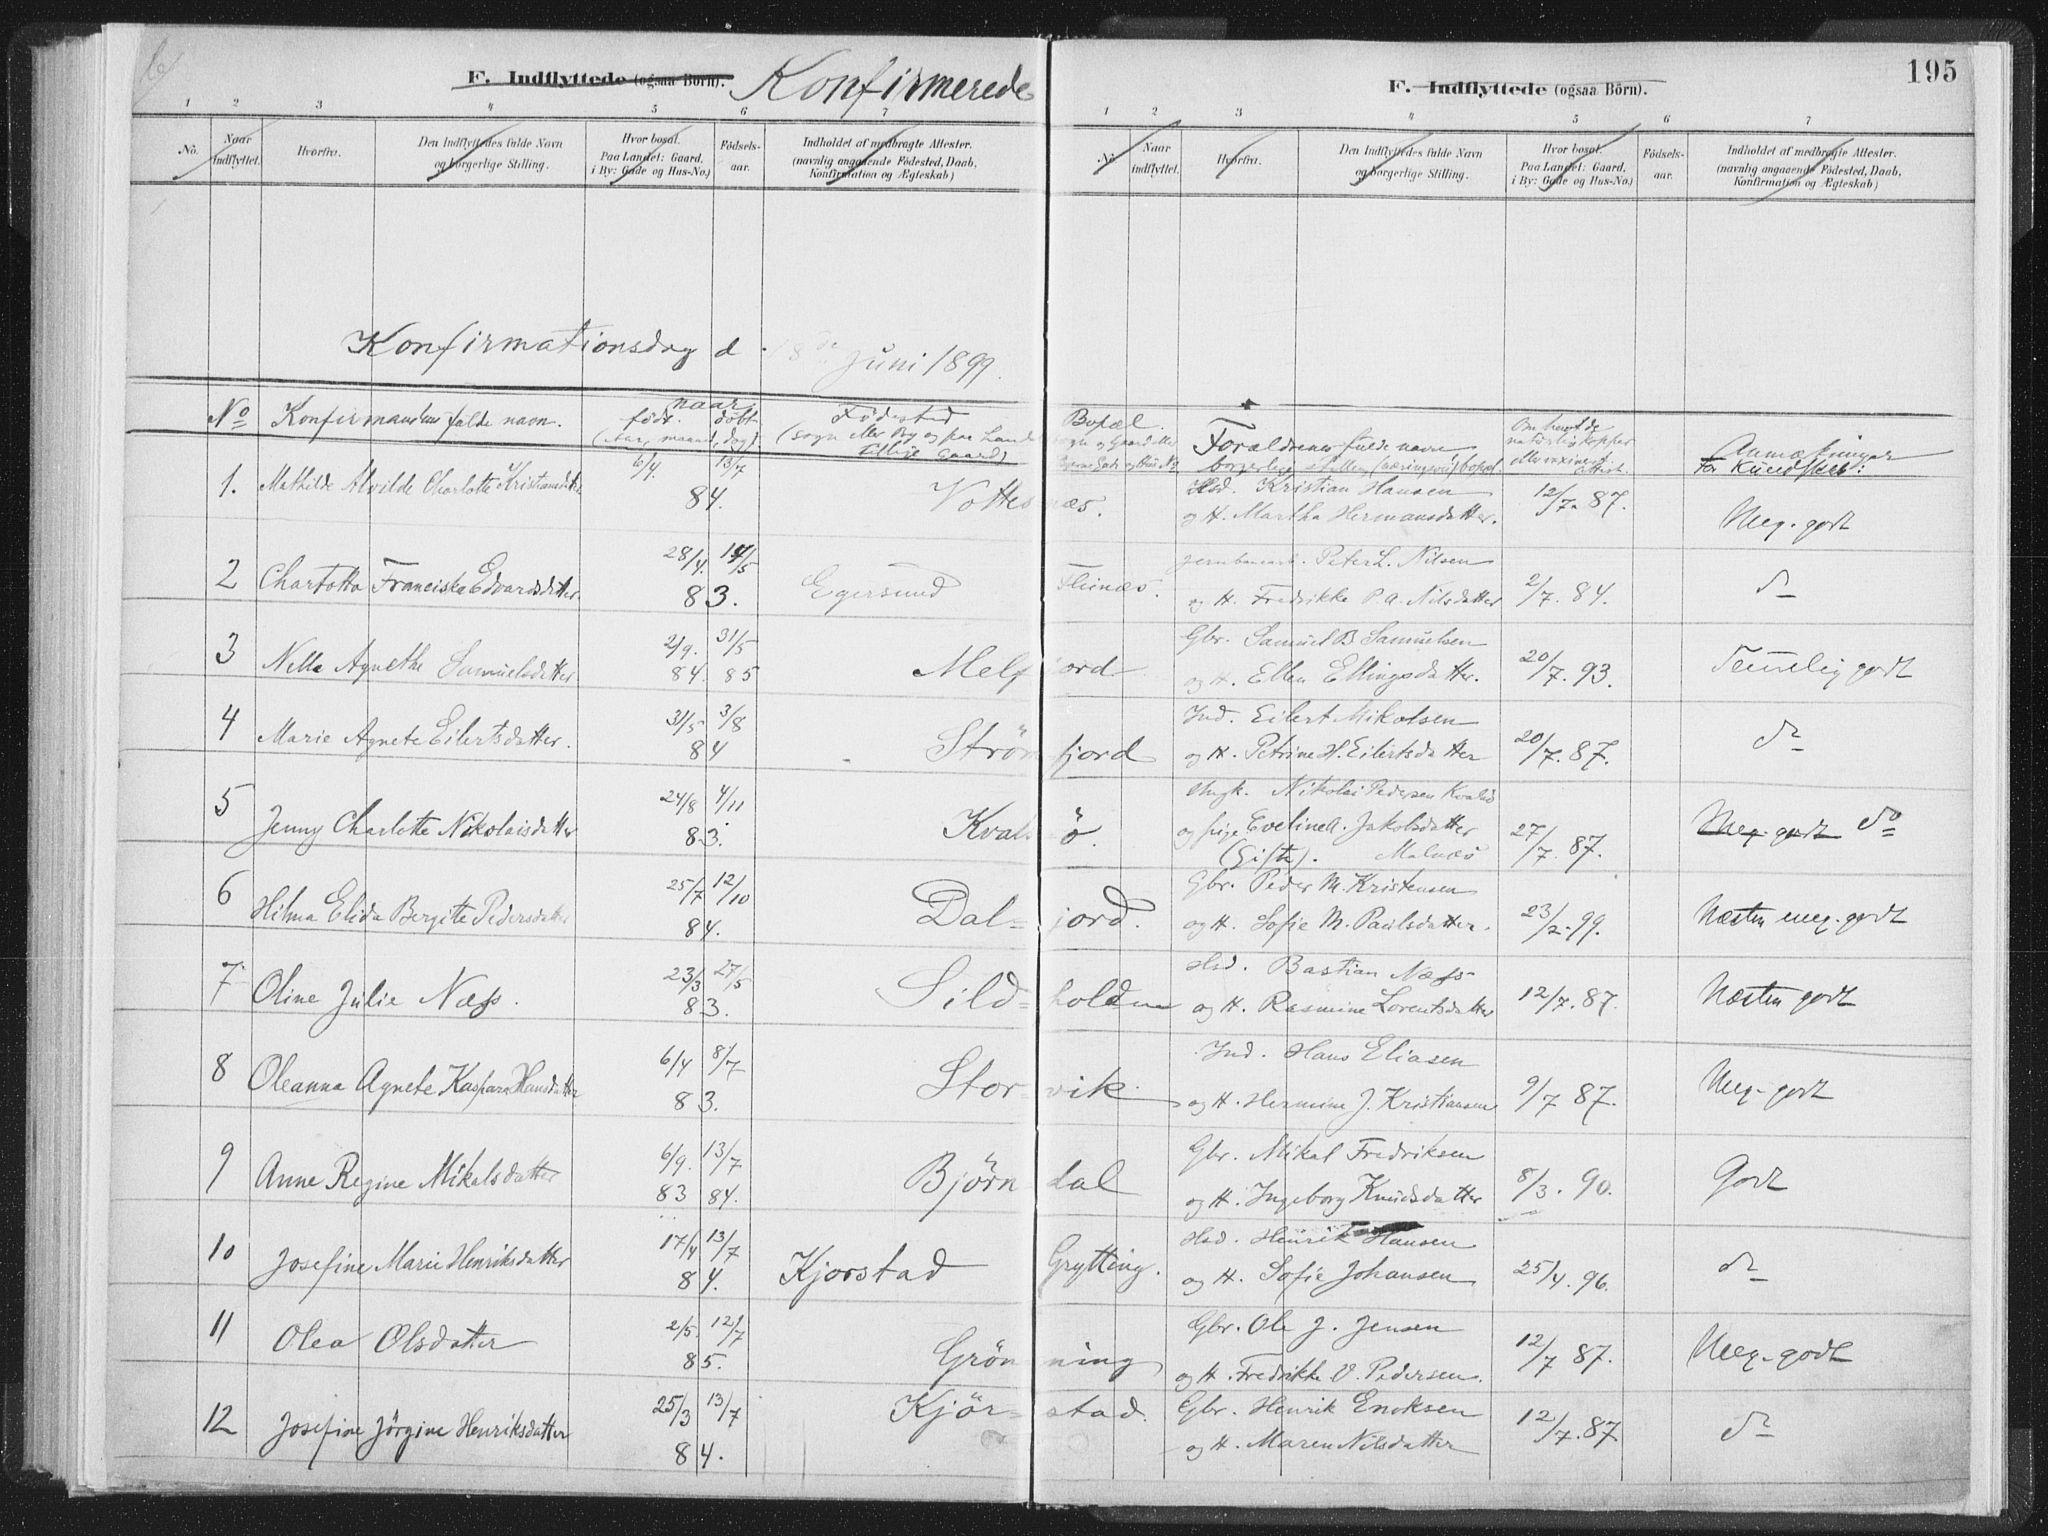 SAT, Ministerialprotokoller, klokkerbøker og fødselsregistre - Nordland, 890/L1286: Ministerialbok nr. 890A01, 1882-1902, s. 195